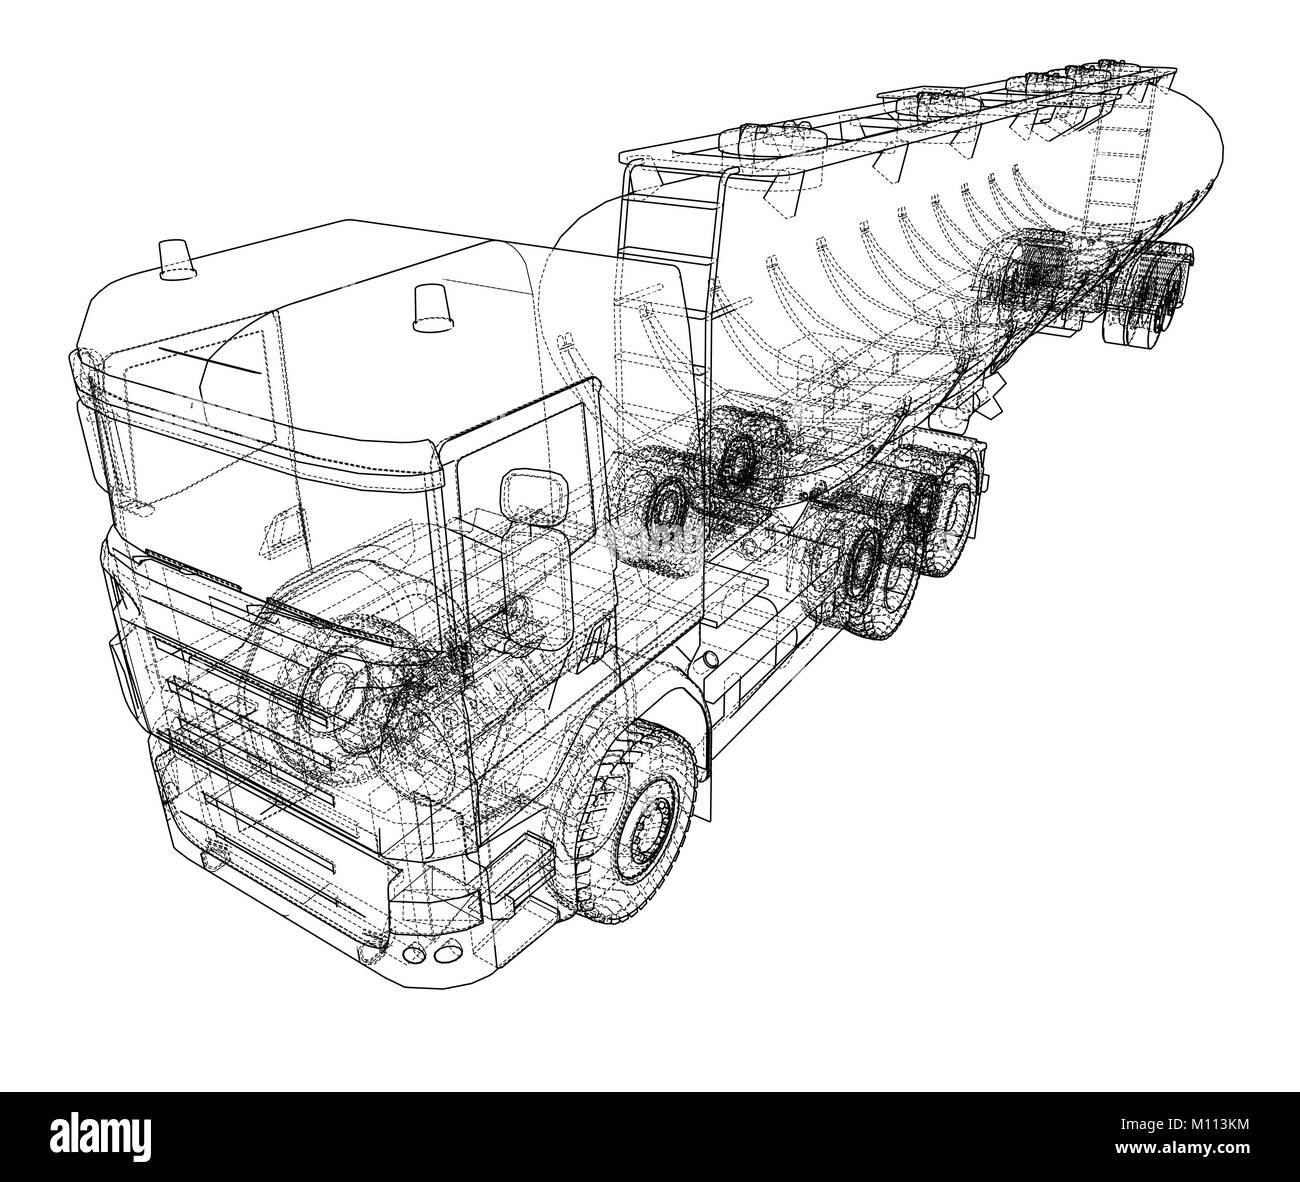 Öl Lkw Skizze Abbildung Vektor Abbildung - Bild: 172743192 - Alamy